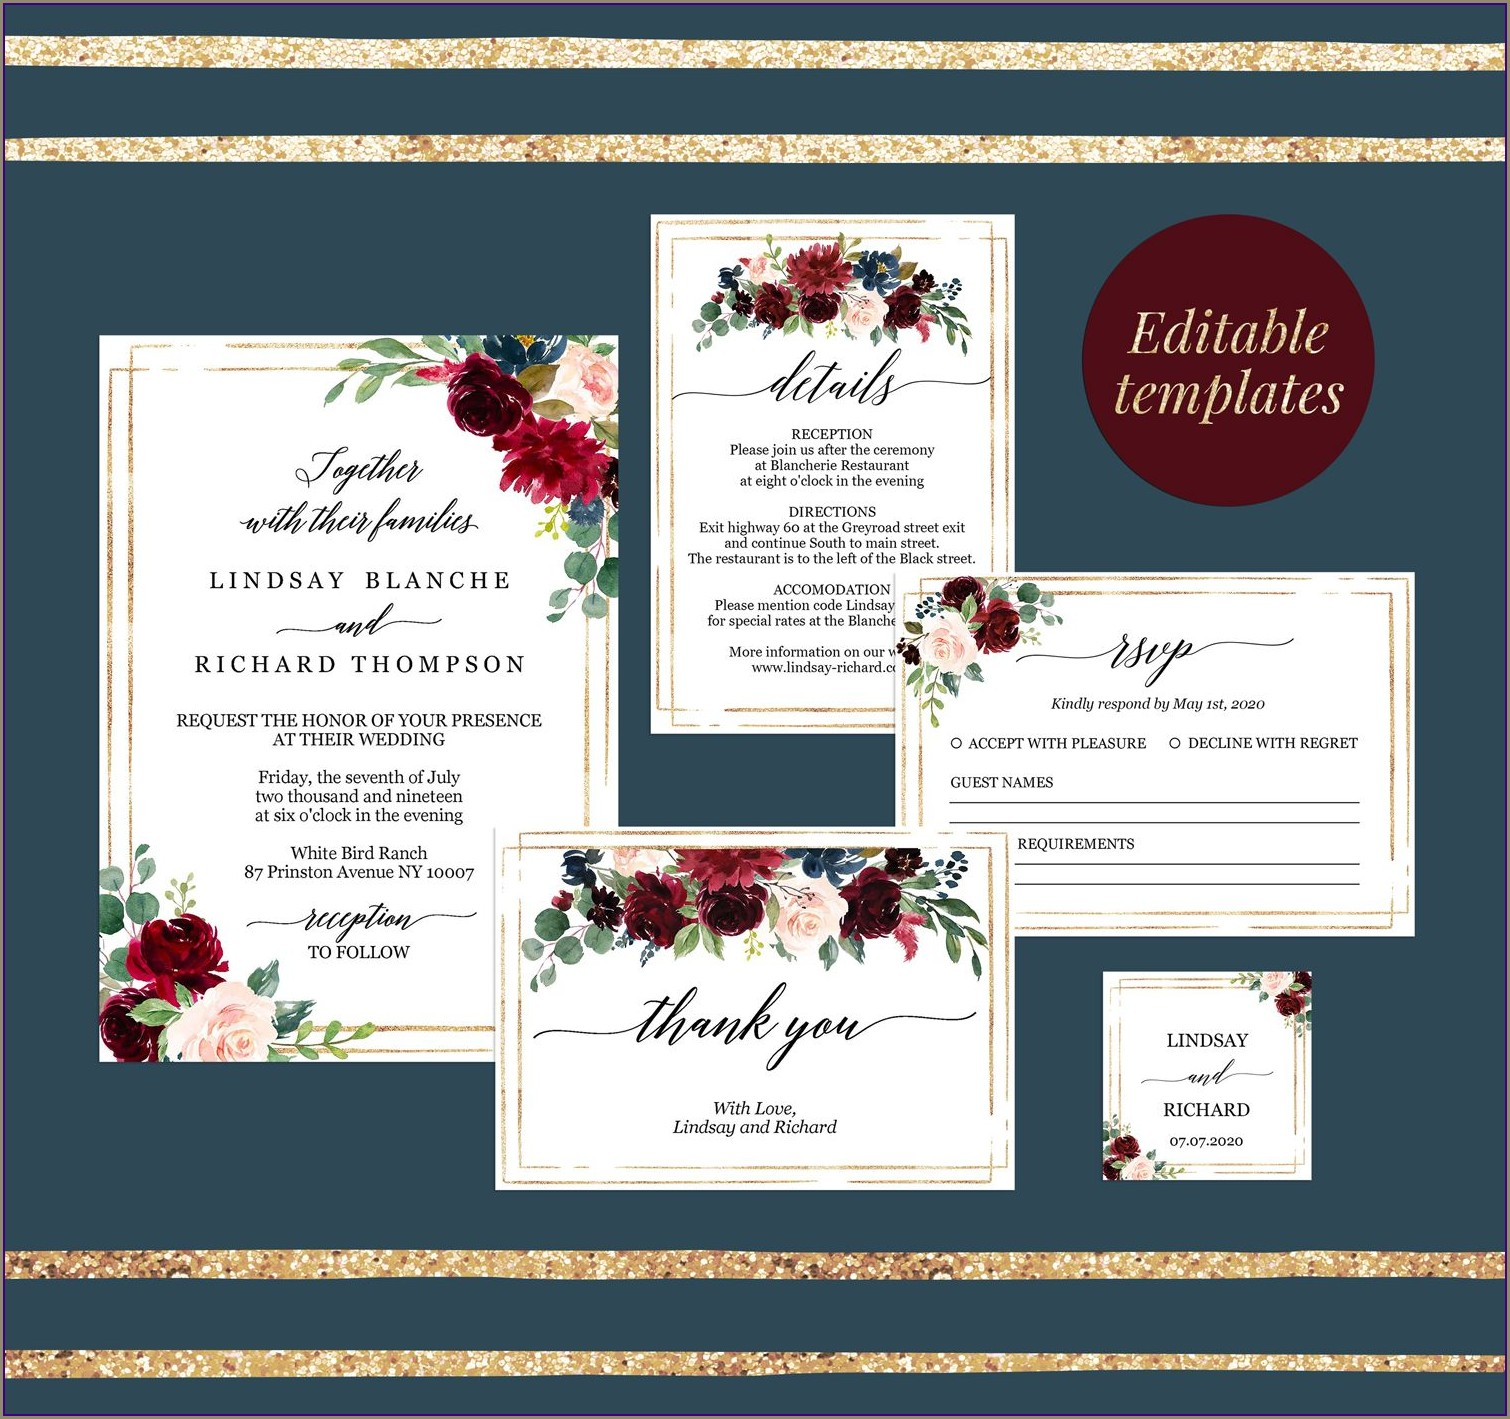 Editable Burgundy Wedding Invitation Templates